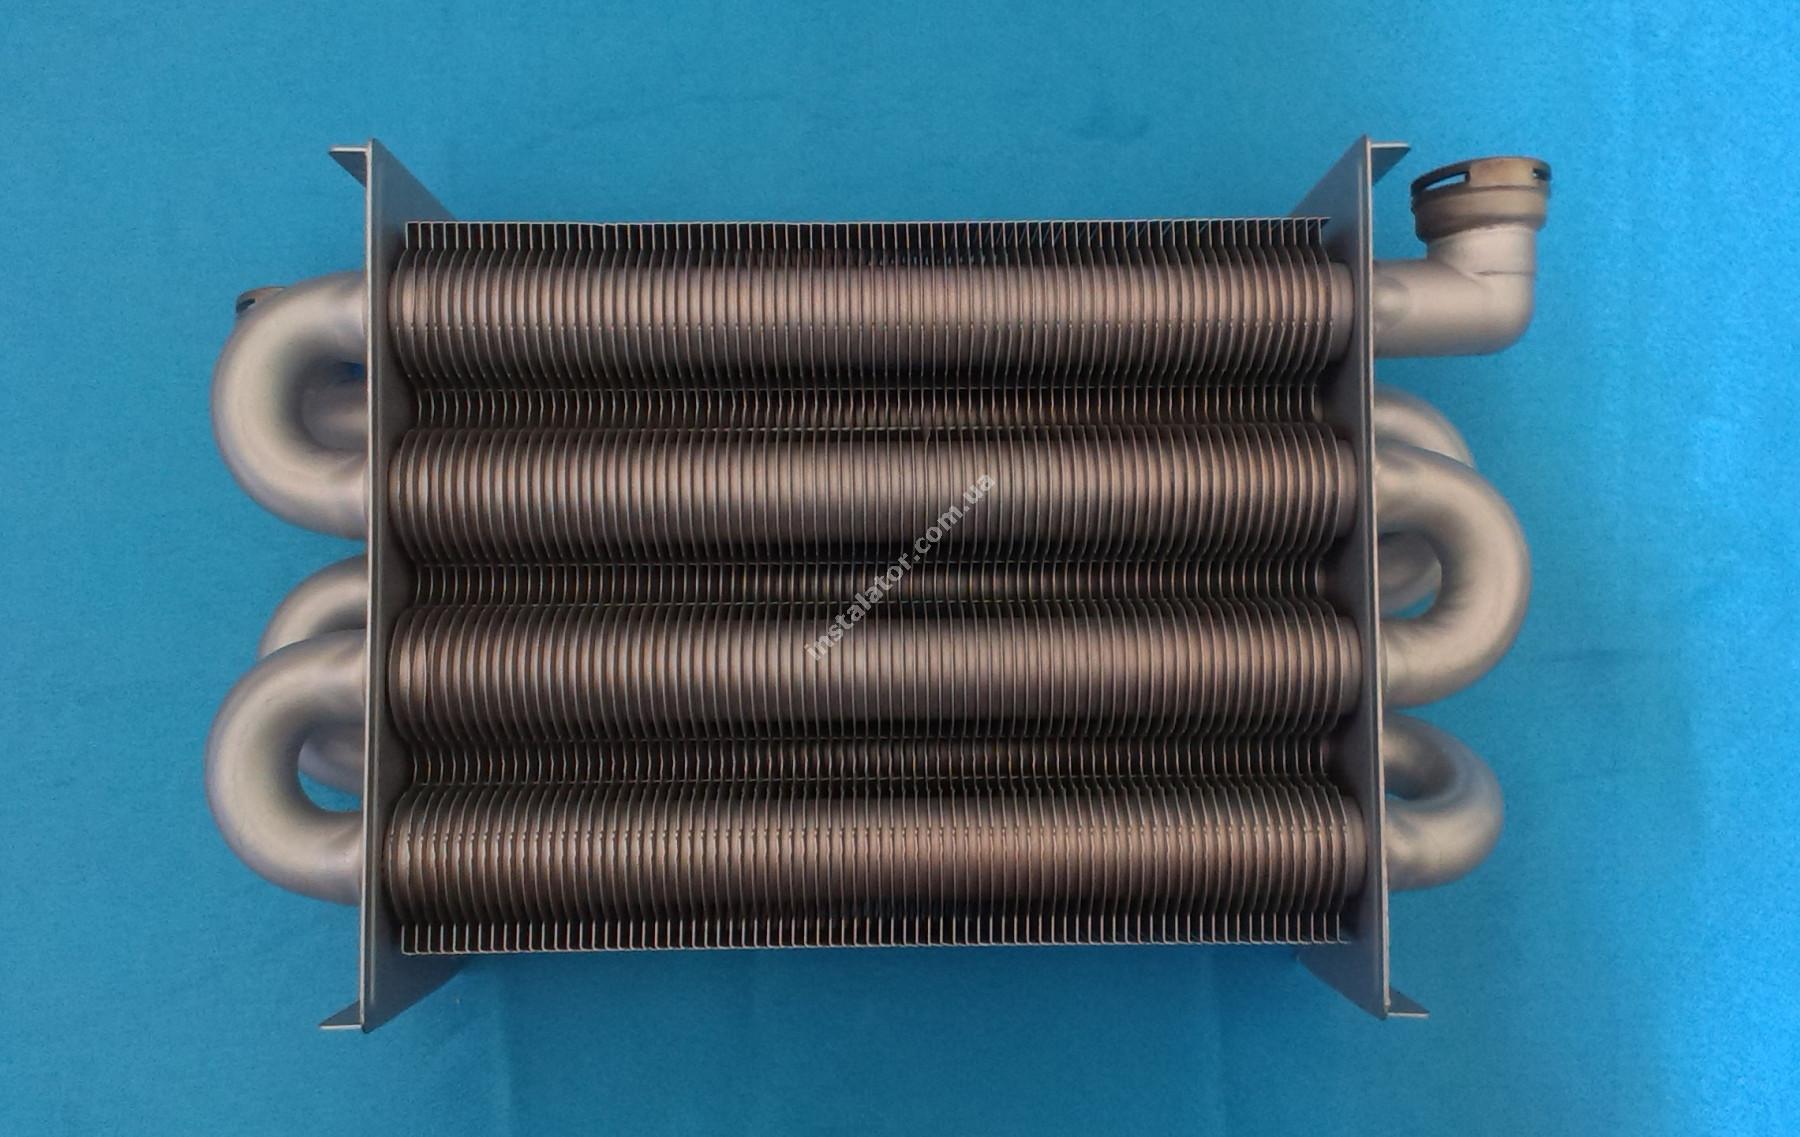 65100425 Теплообмінник первинний ARISTON Uno (турбо) full-image-0